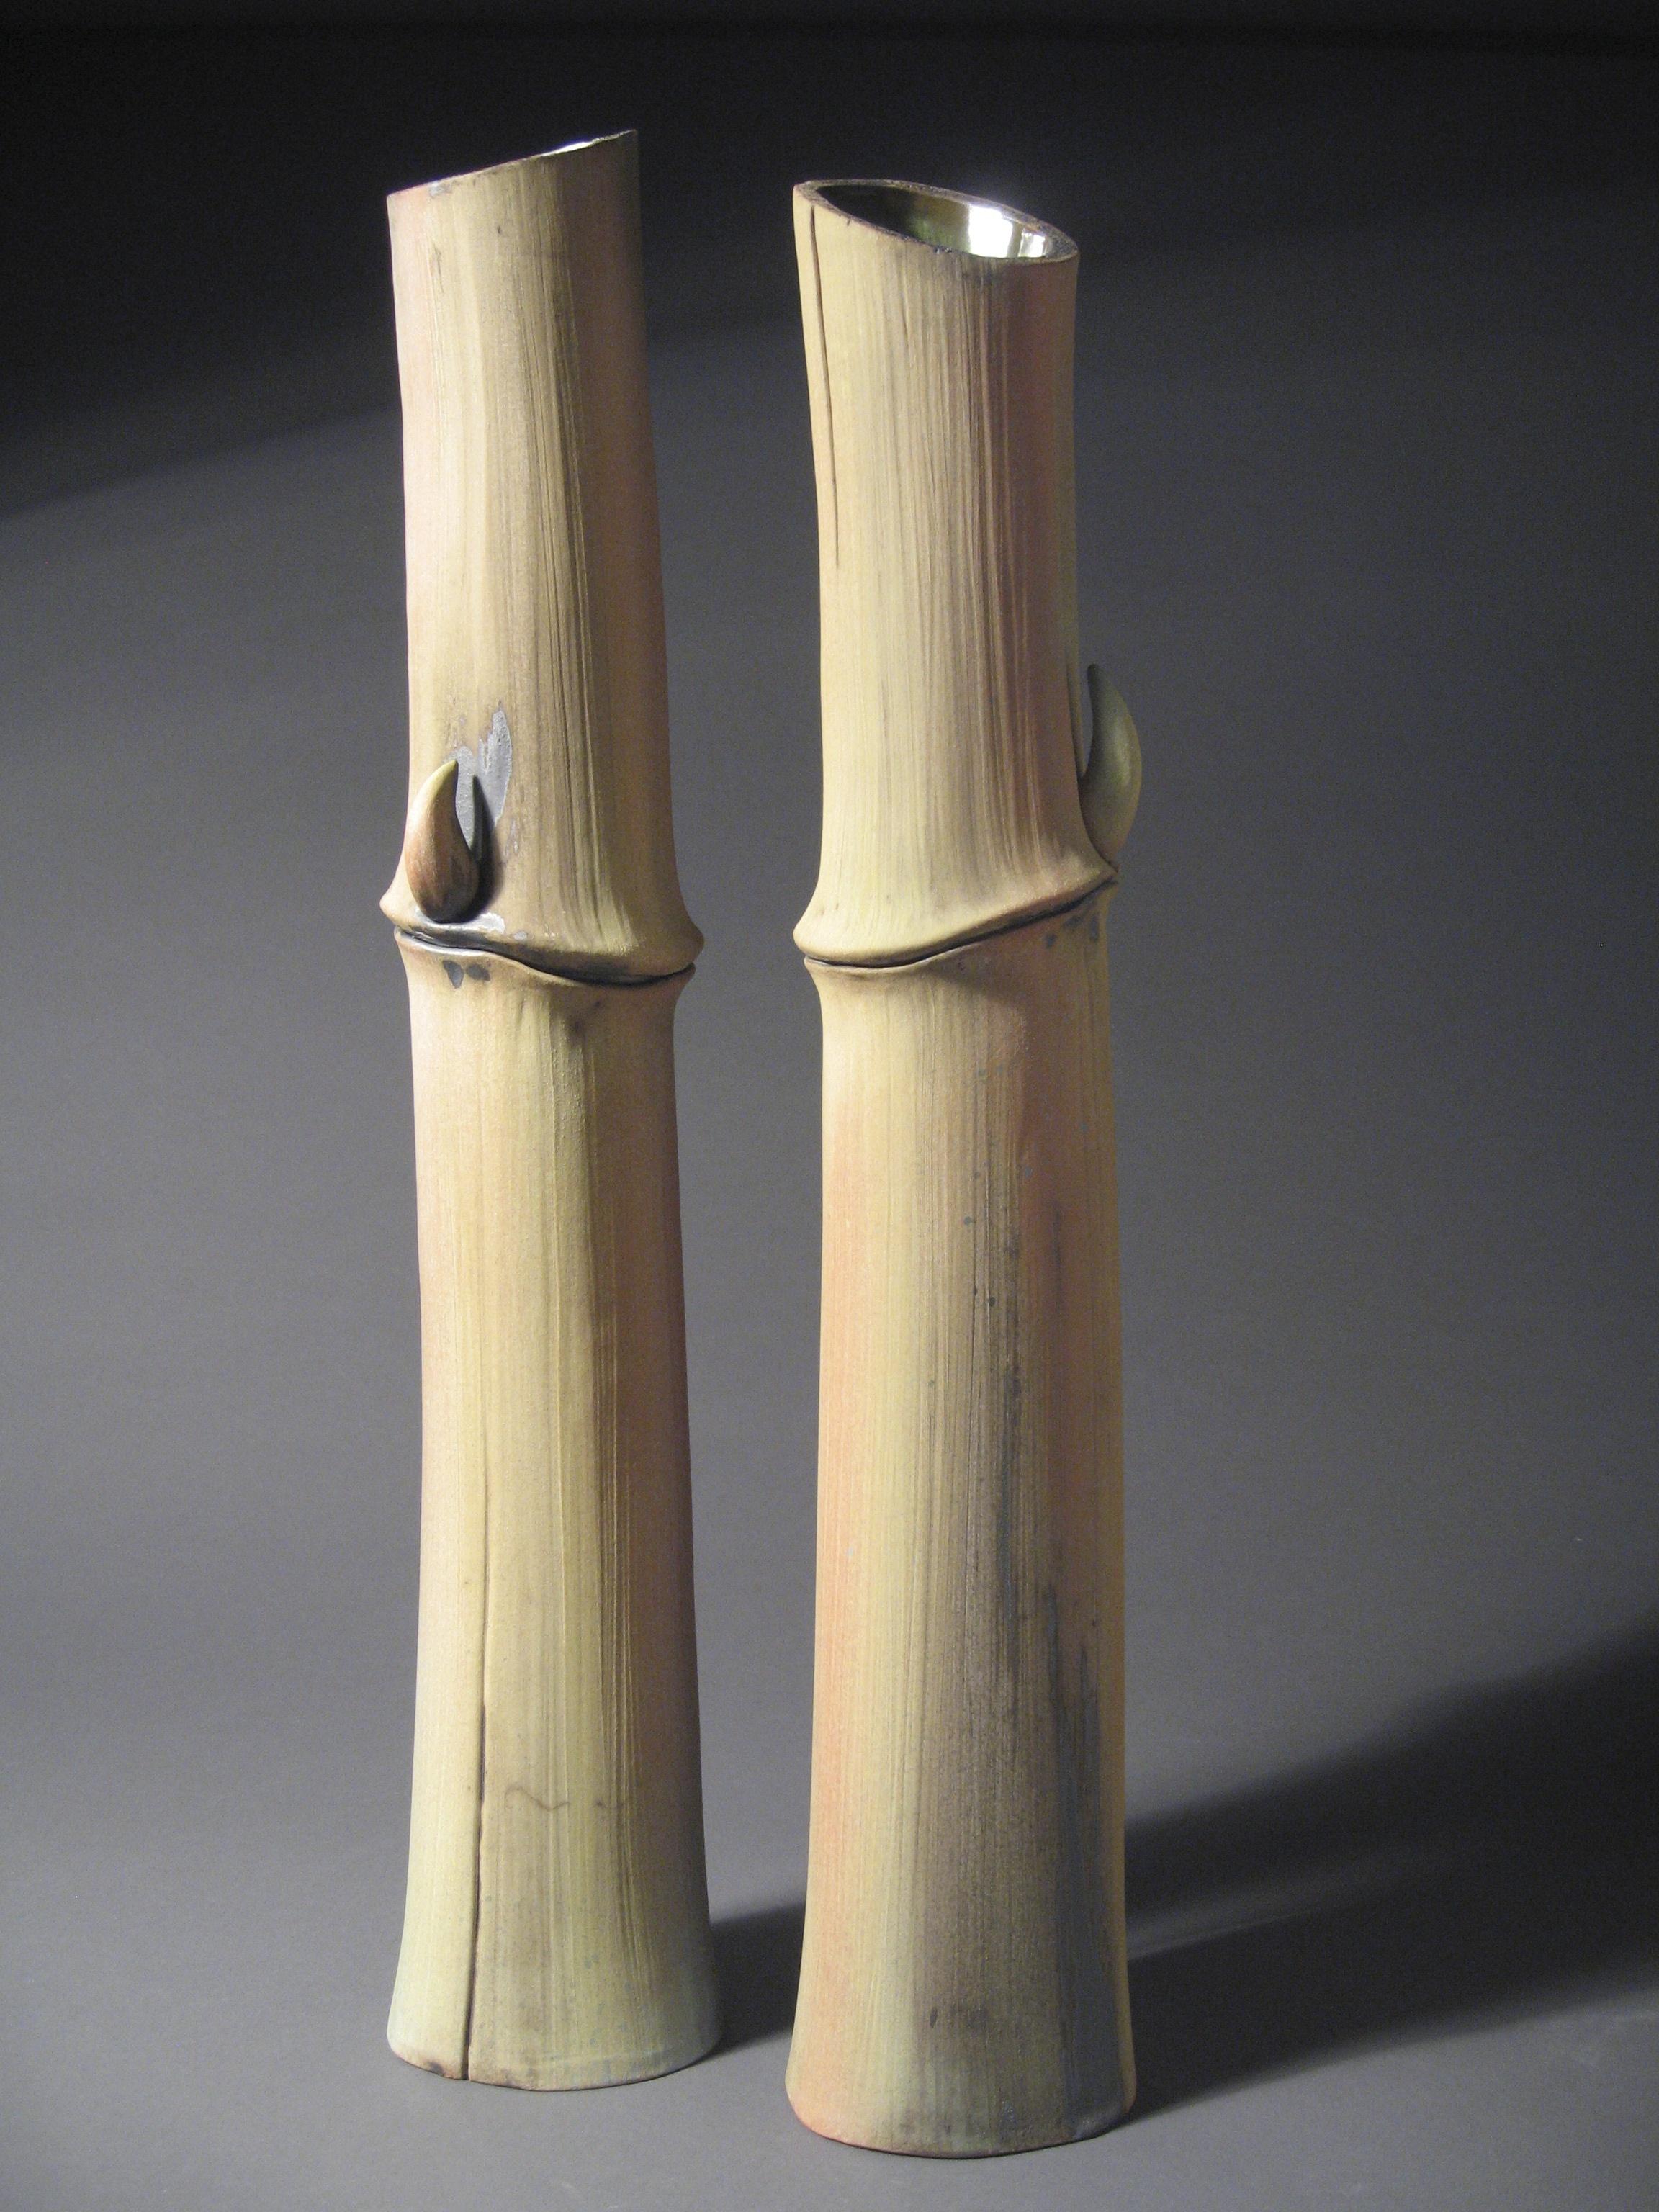 5 Bamboo Pair, white earthenware, terra sigillata, glaze liner, ea. 24 x 4 (1).jpg